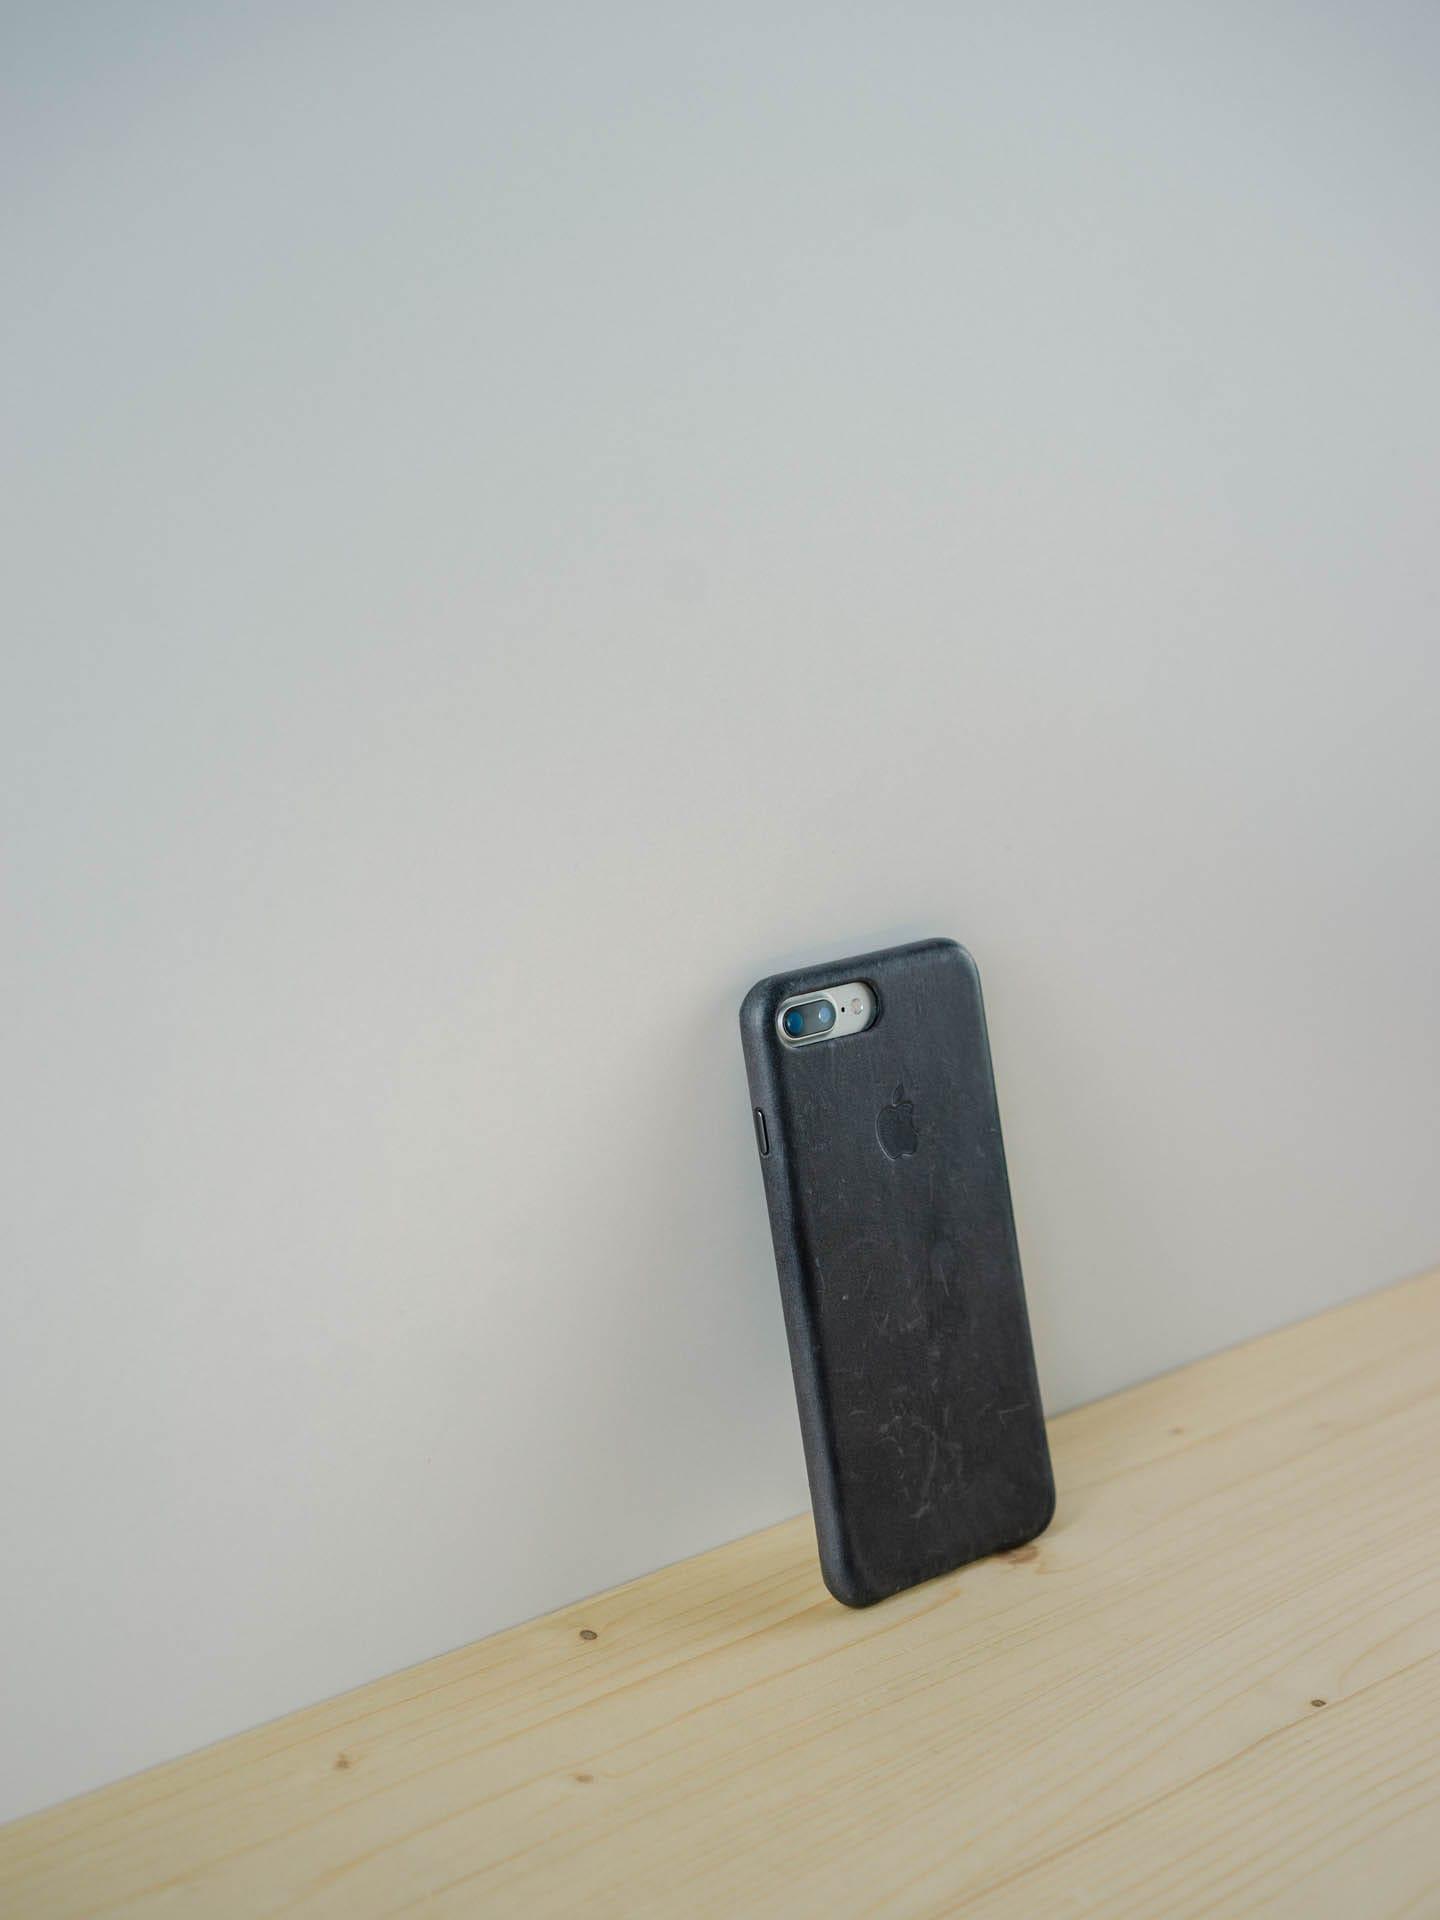 bookbook iphone 7 plus review